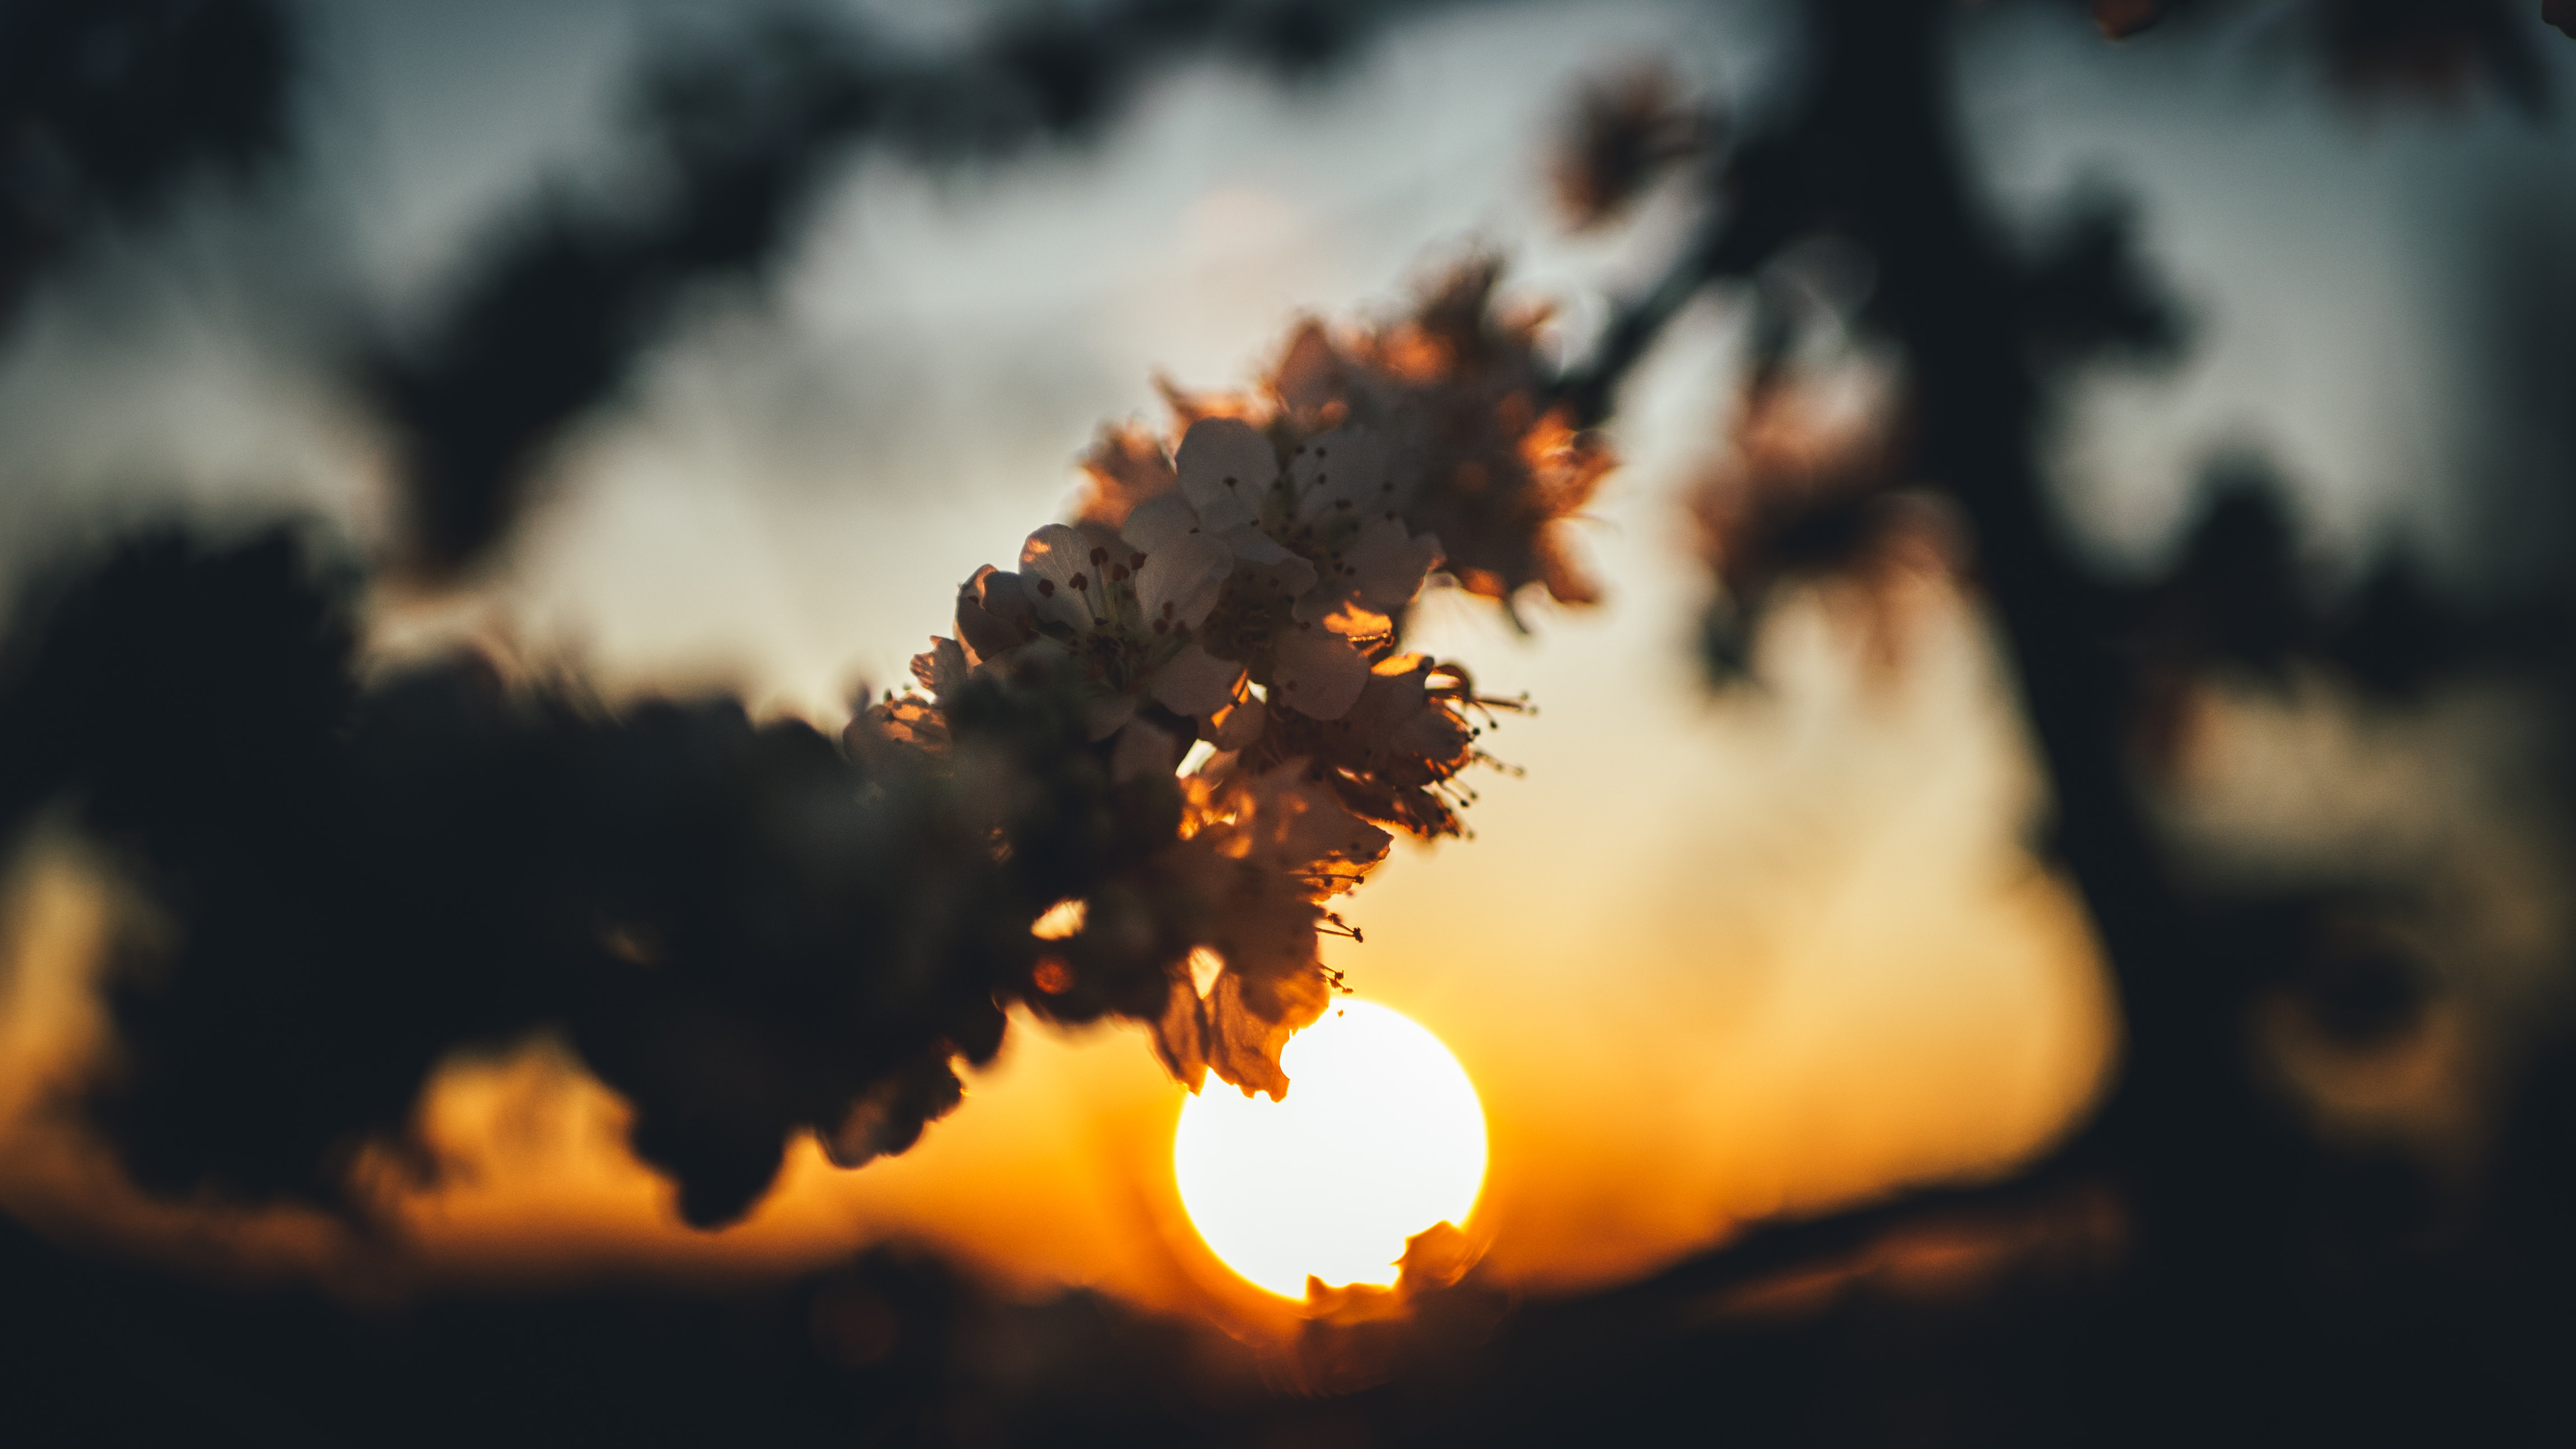 119949 Заставки и Обои Вишня на телефон. Скачать Цветы, Закат, Вишня, Солнце, Ветка картинки бесплатно